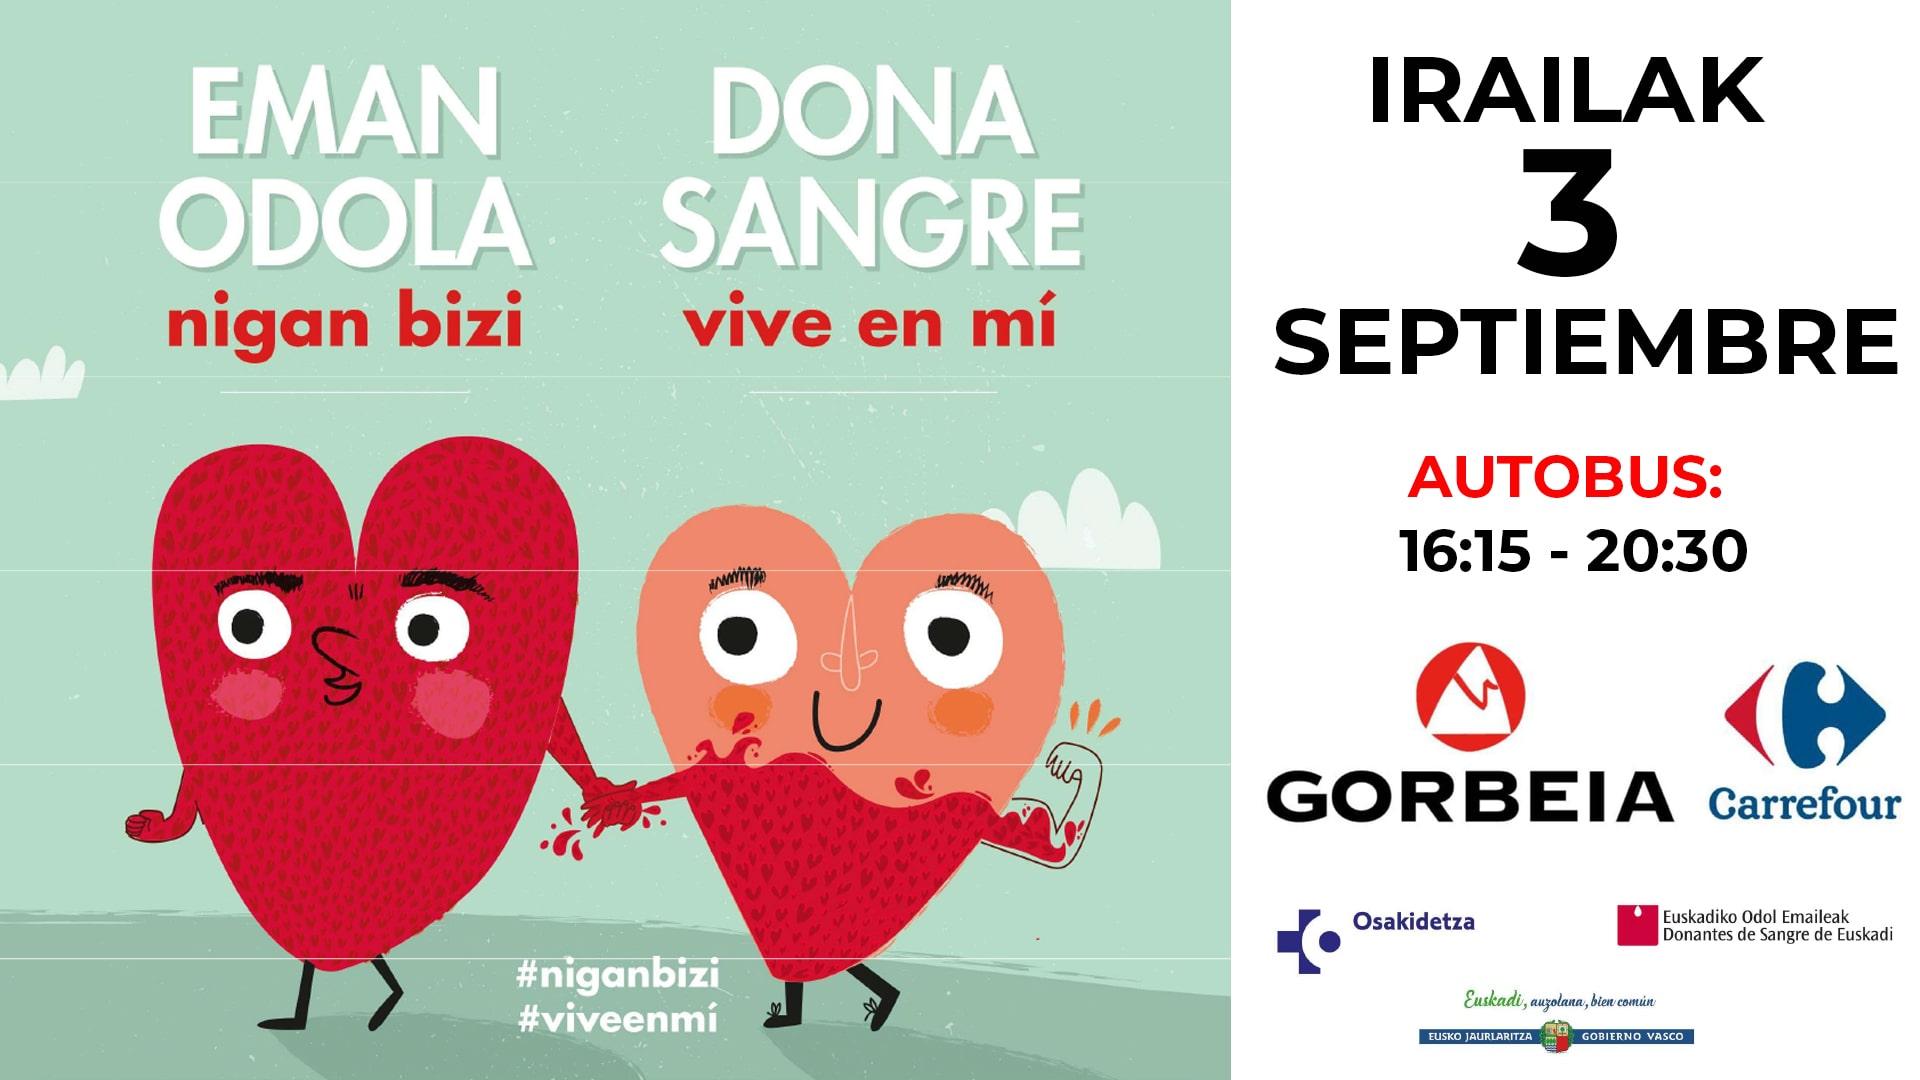 ¡Ven a donar sangre al Parque Comercial Gorbeia!